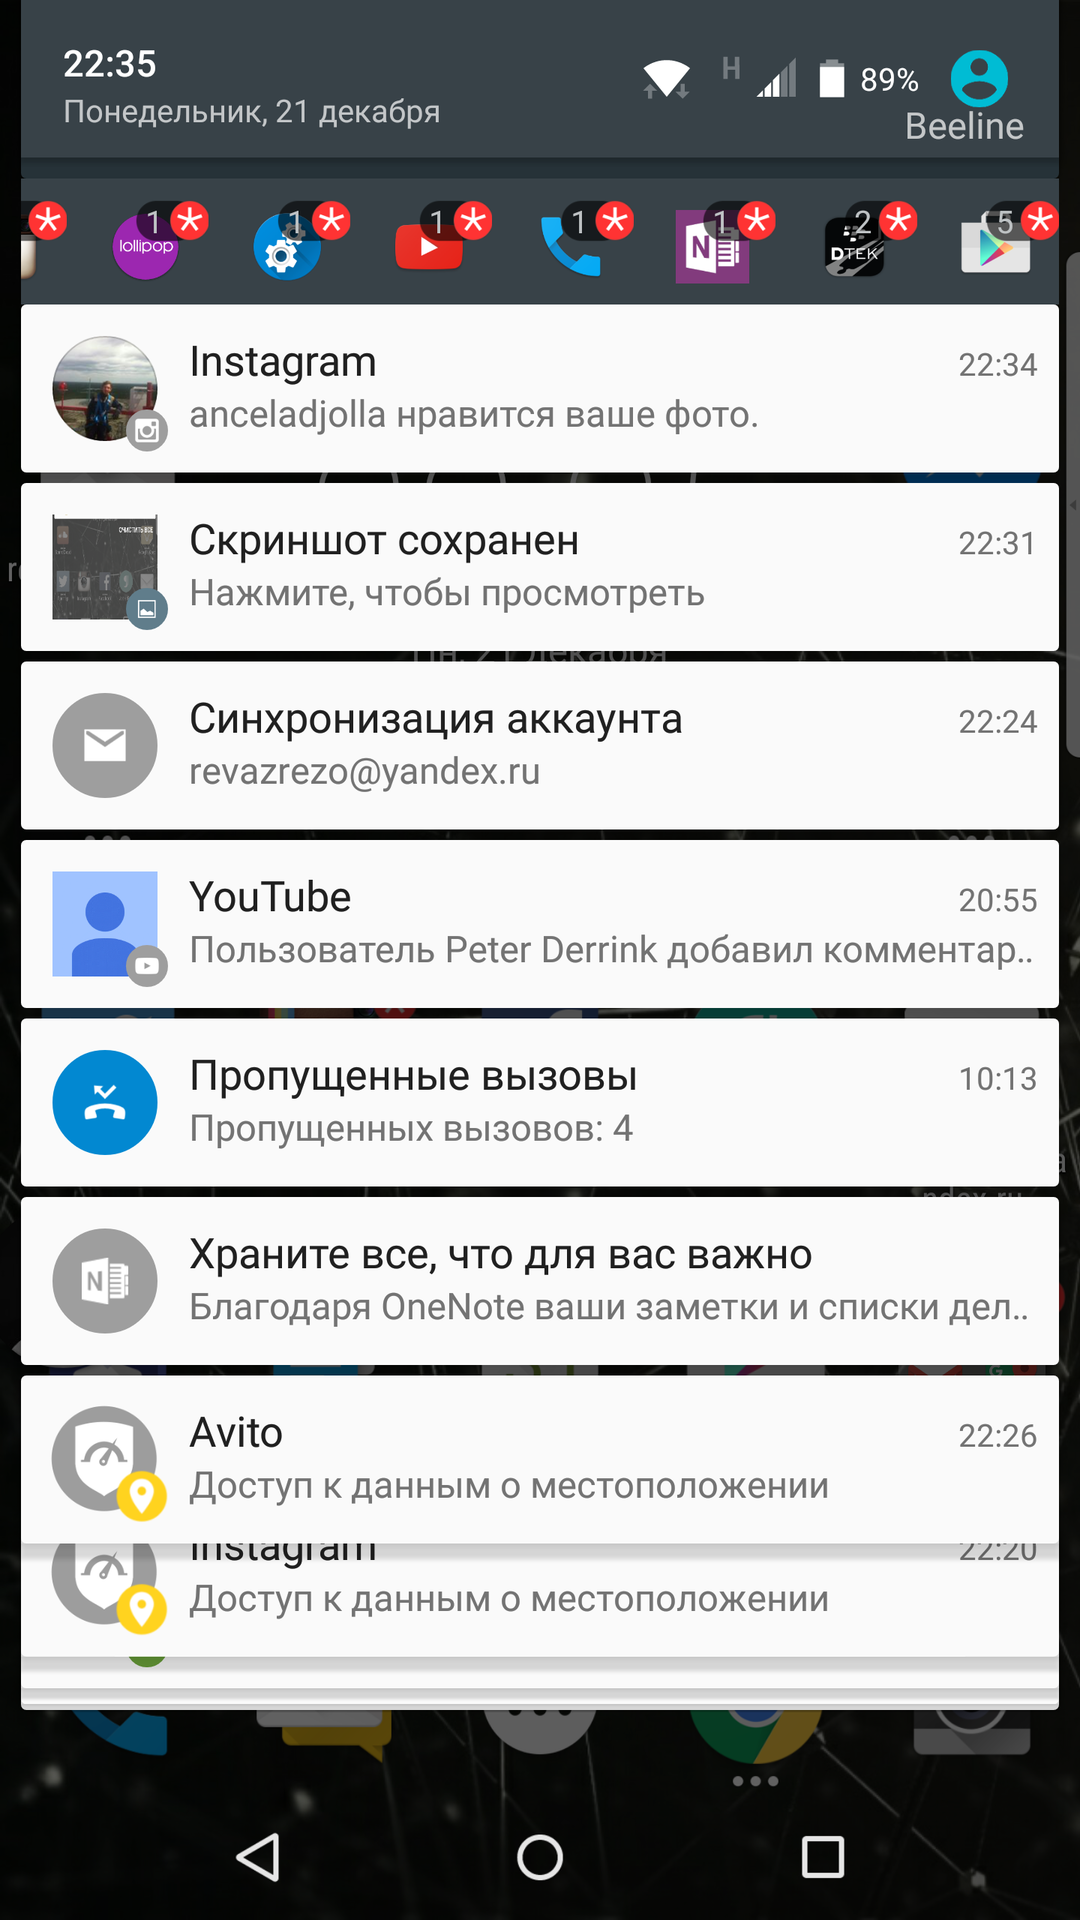 screenshot2015-12-21-22-35-17-1080x1920